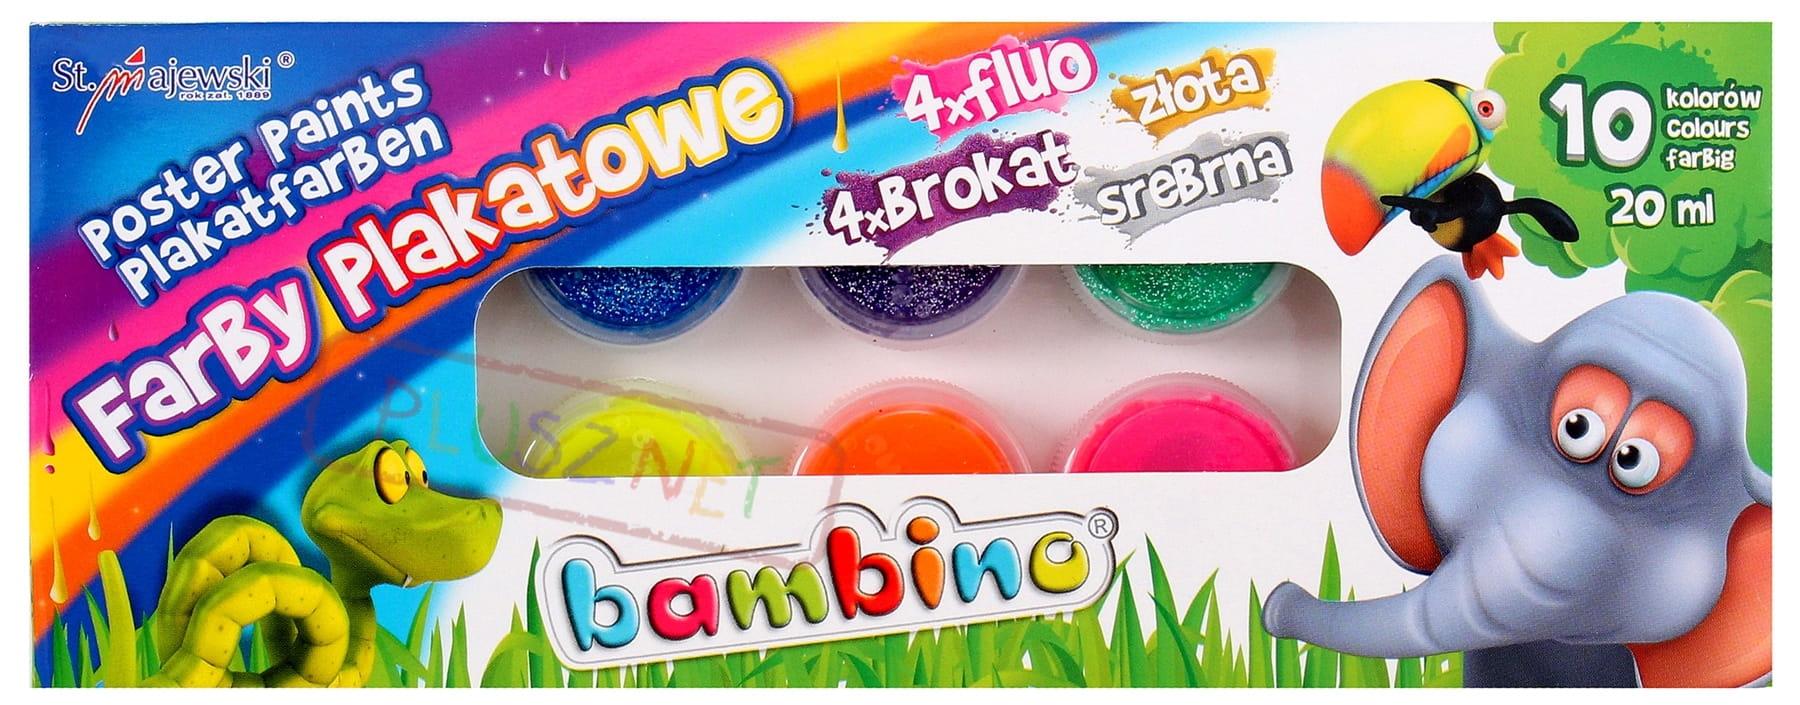 Farby Plakatowe Bambino Farbki 10 Kol Brokat Fluo Plusznet